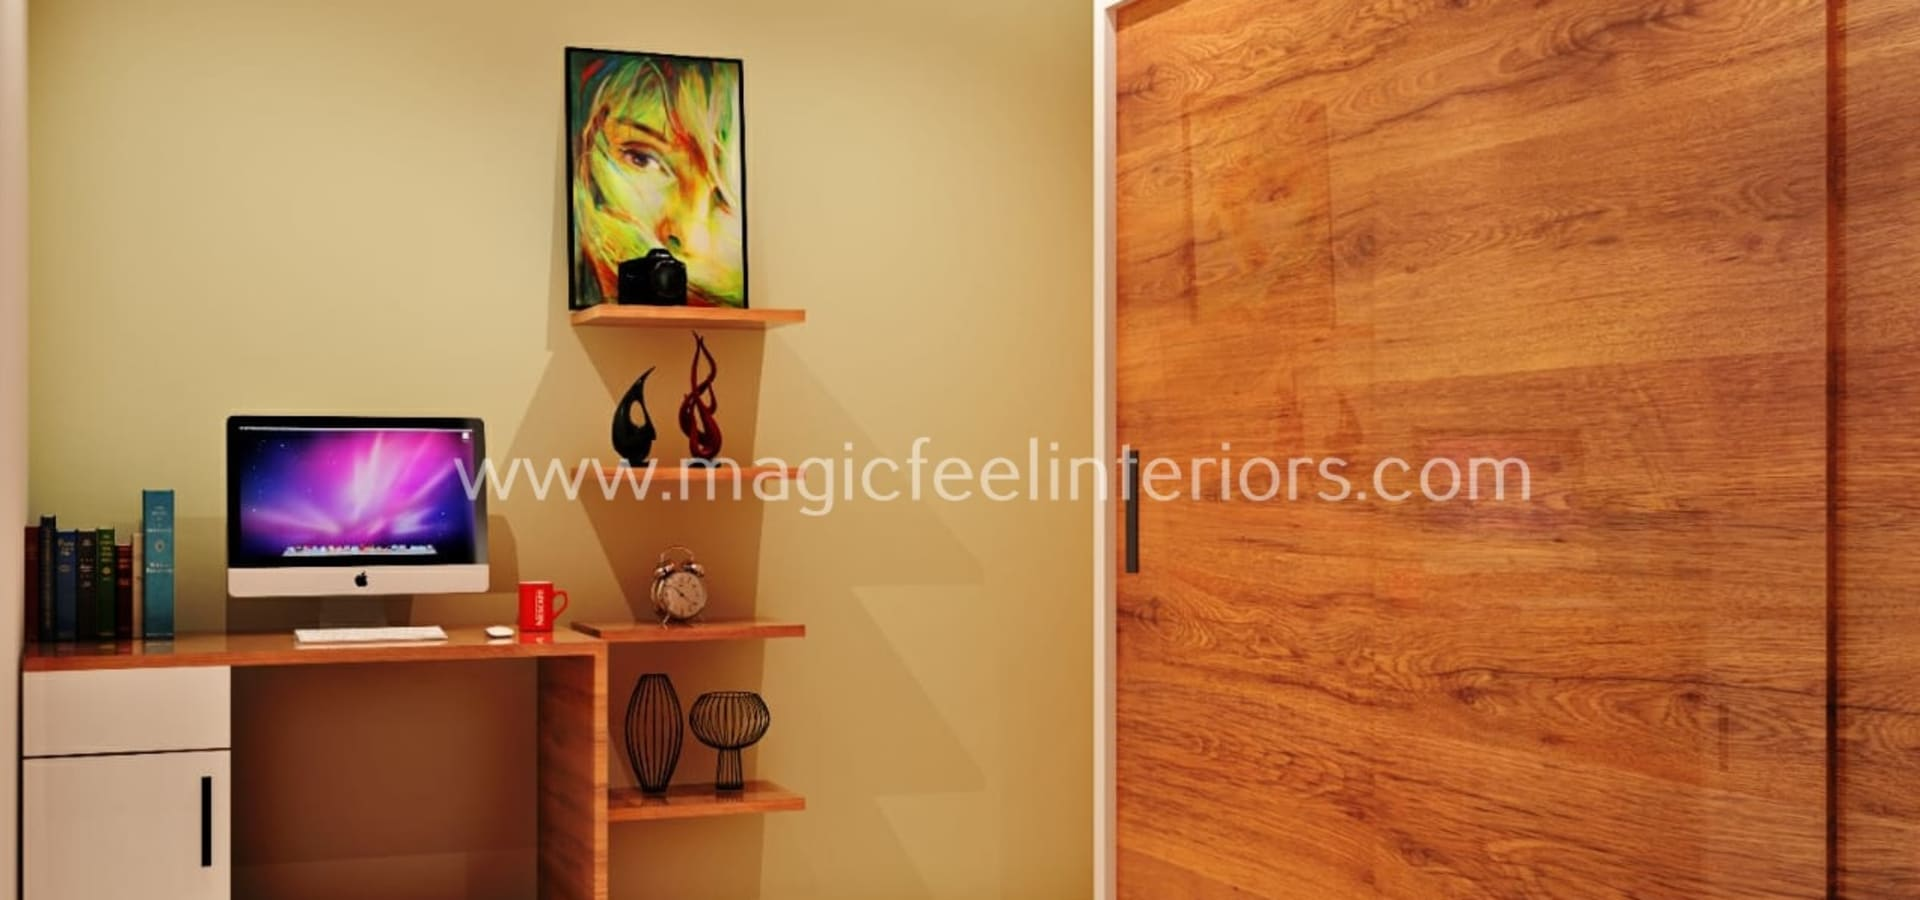 Magic Feel Interiors